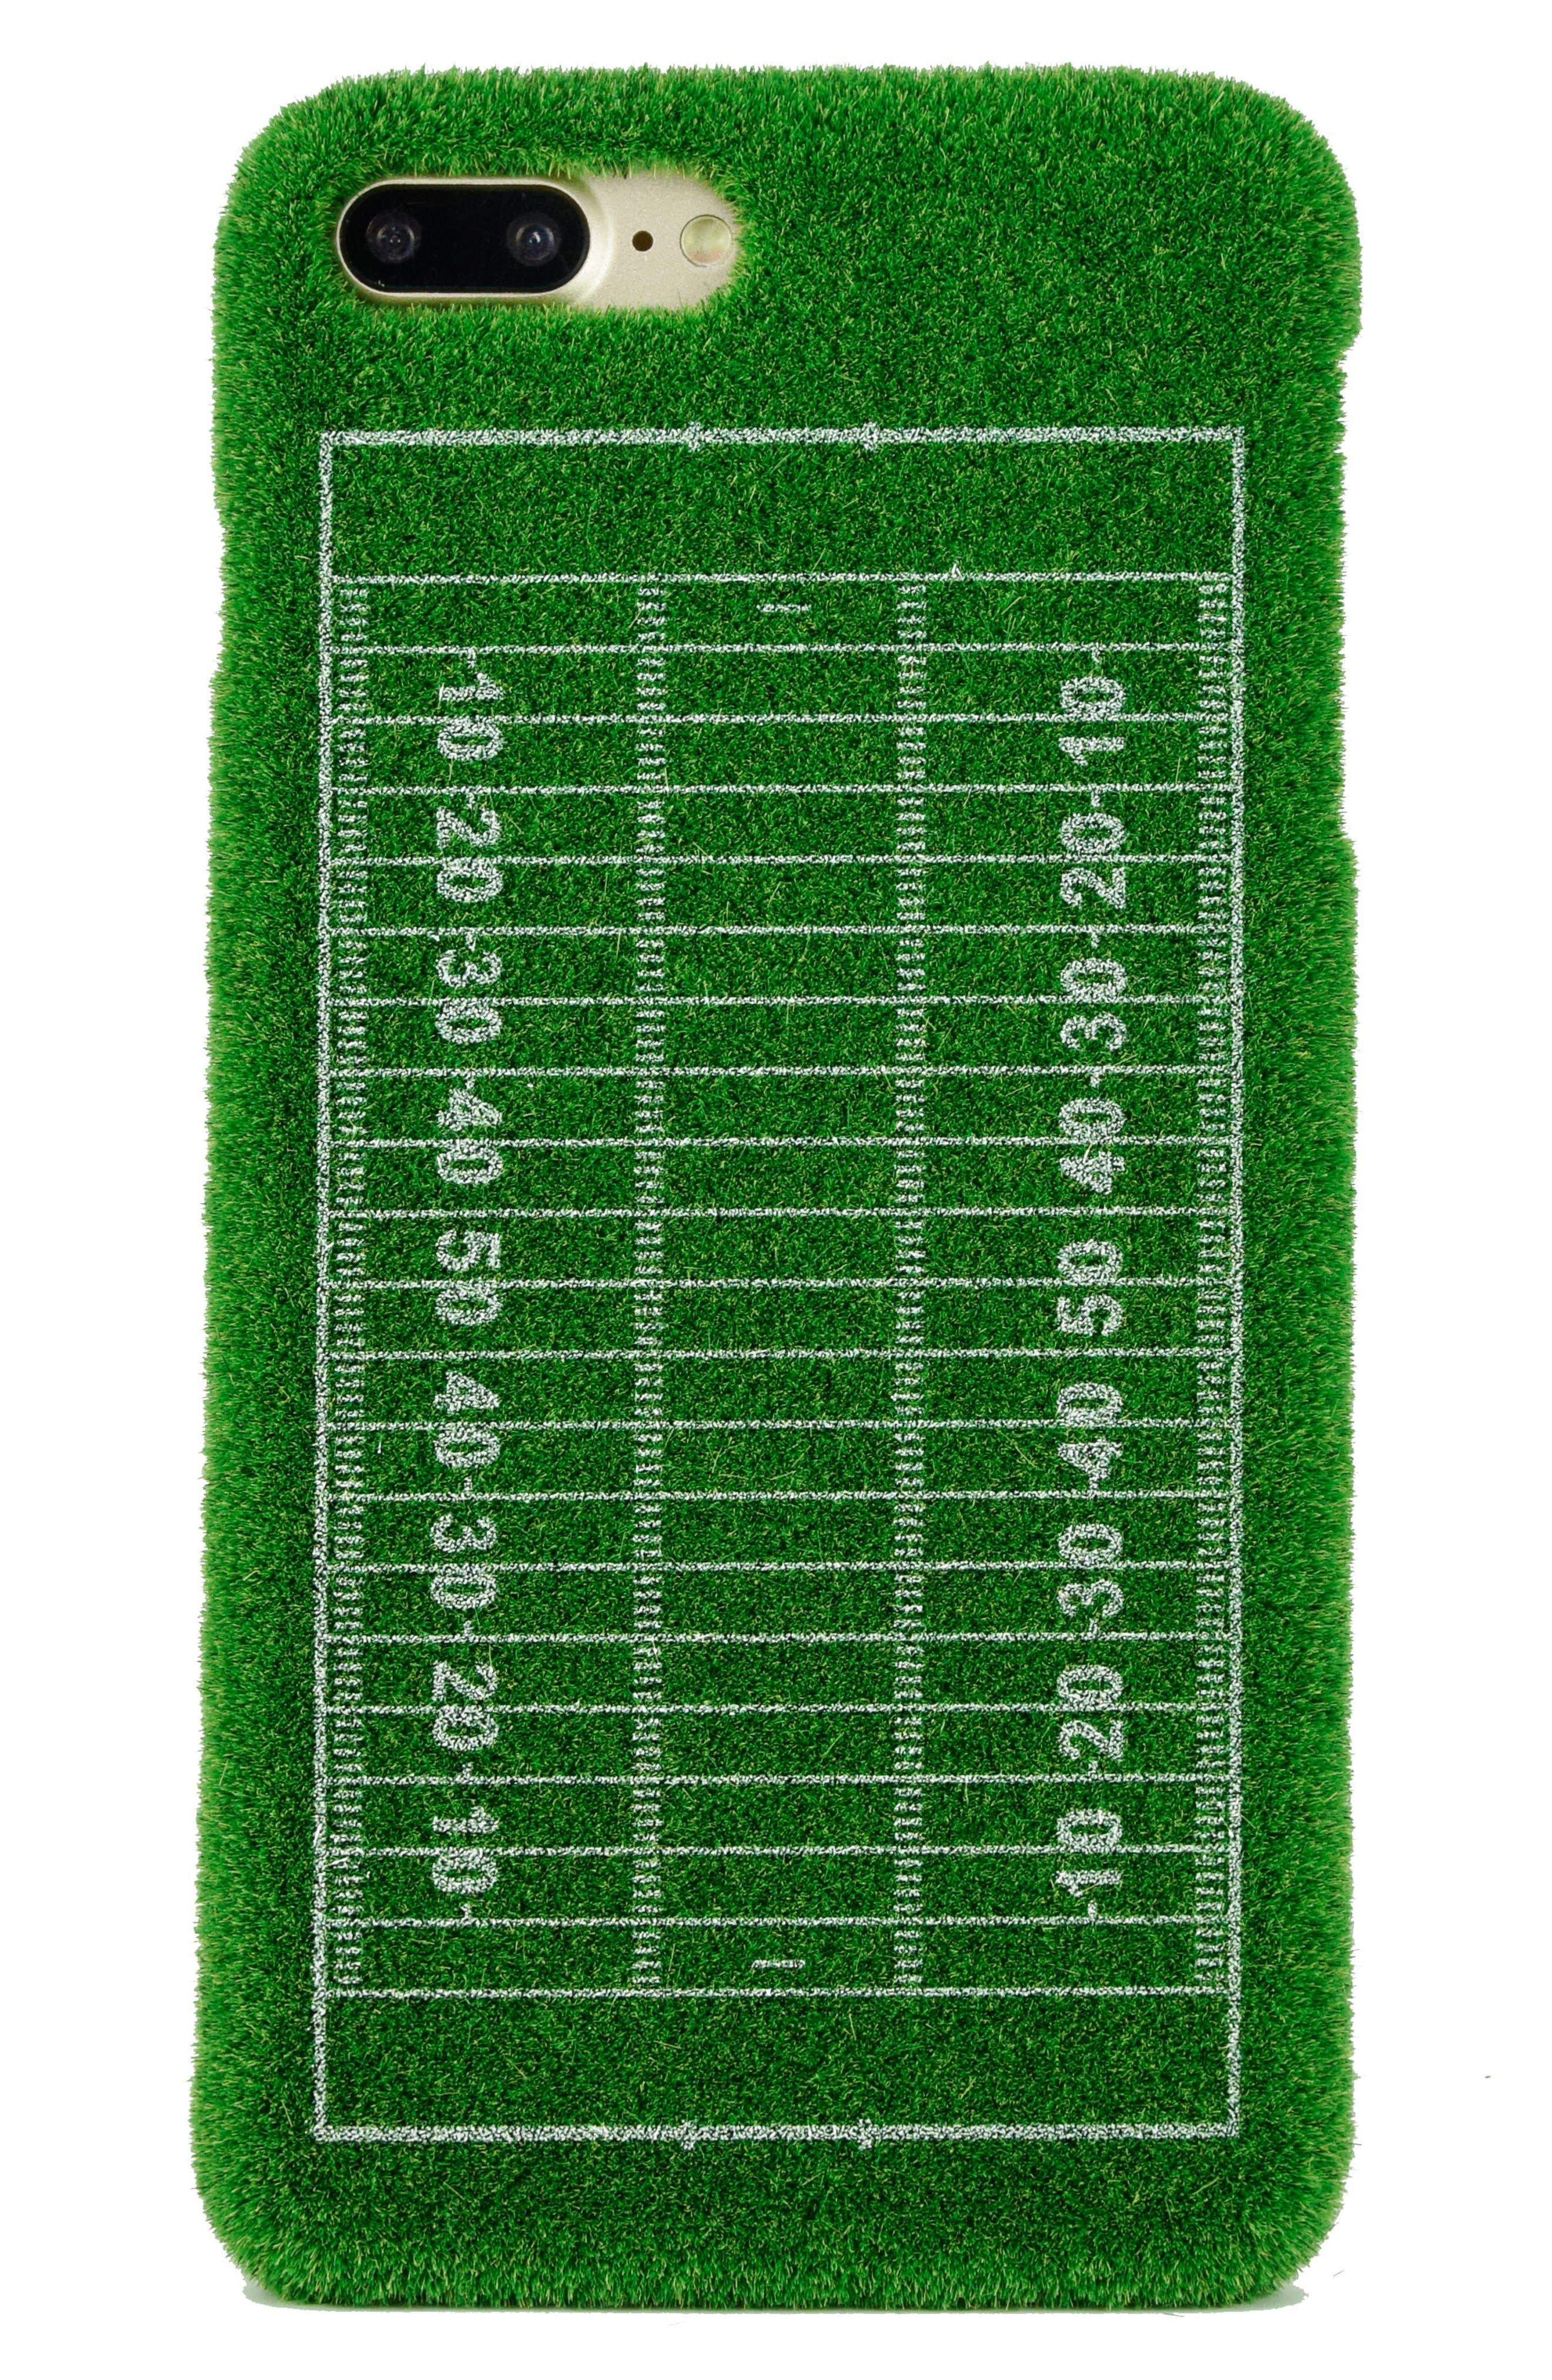 SHIBAFUL Super Bowl Portable Park iPhone 7 & iPhone 7 Plus Case